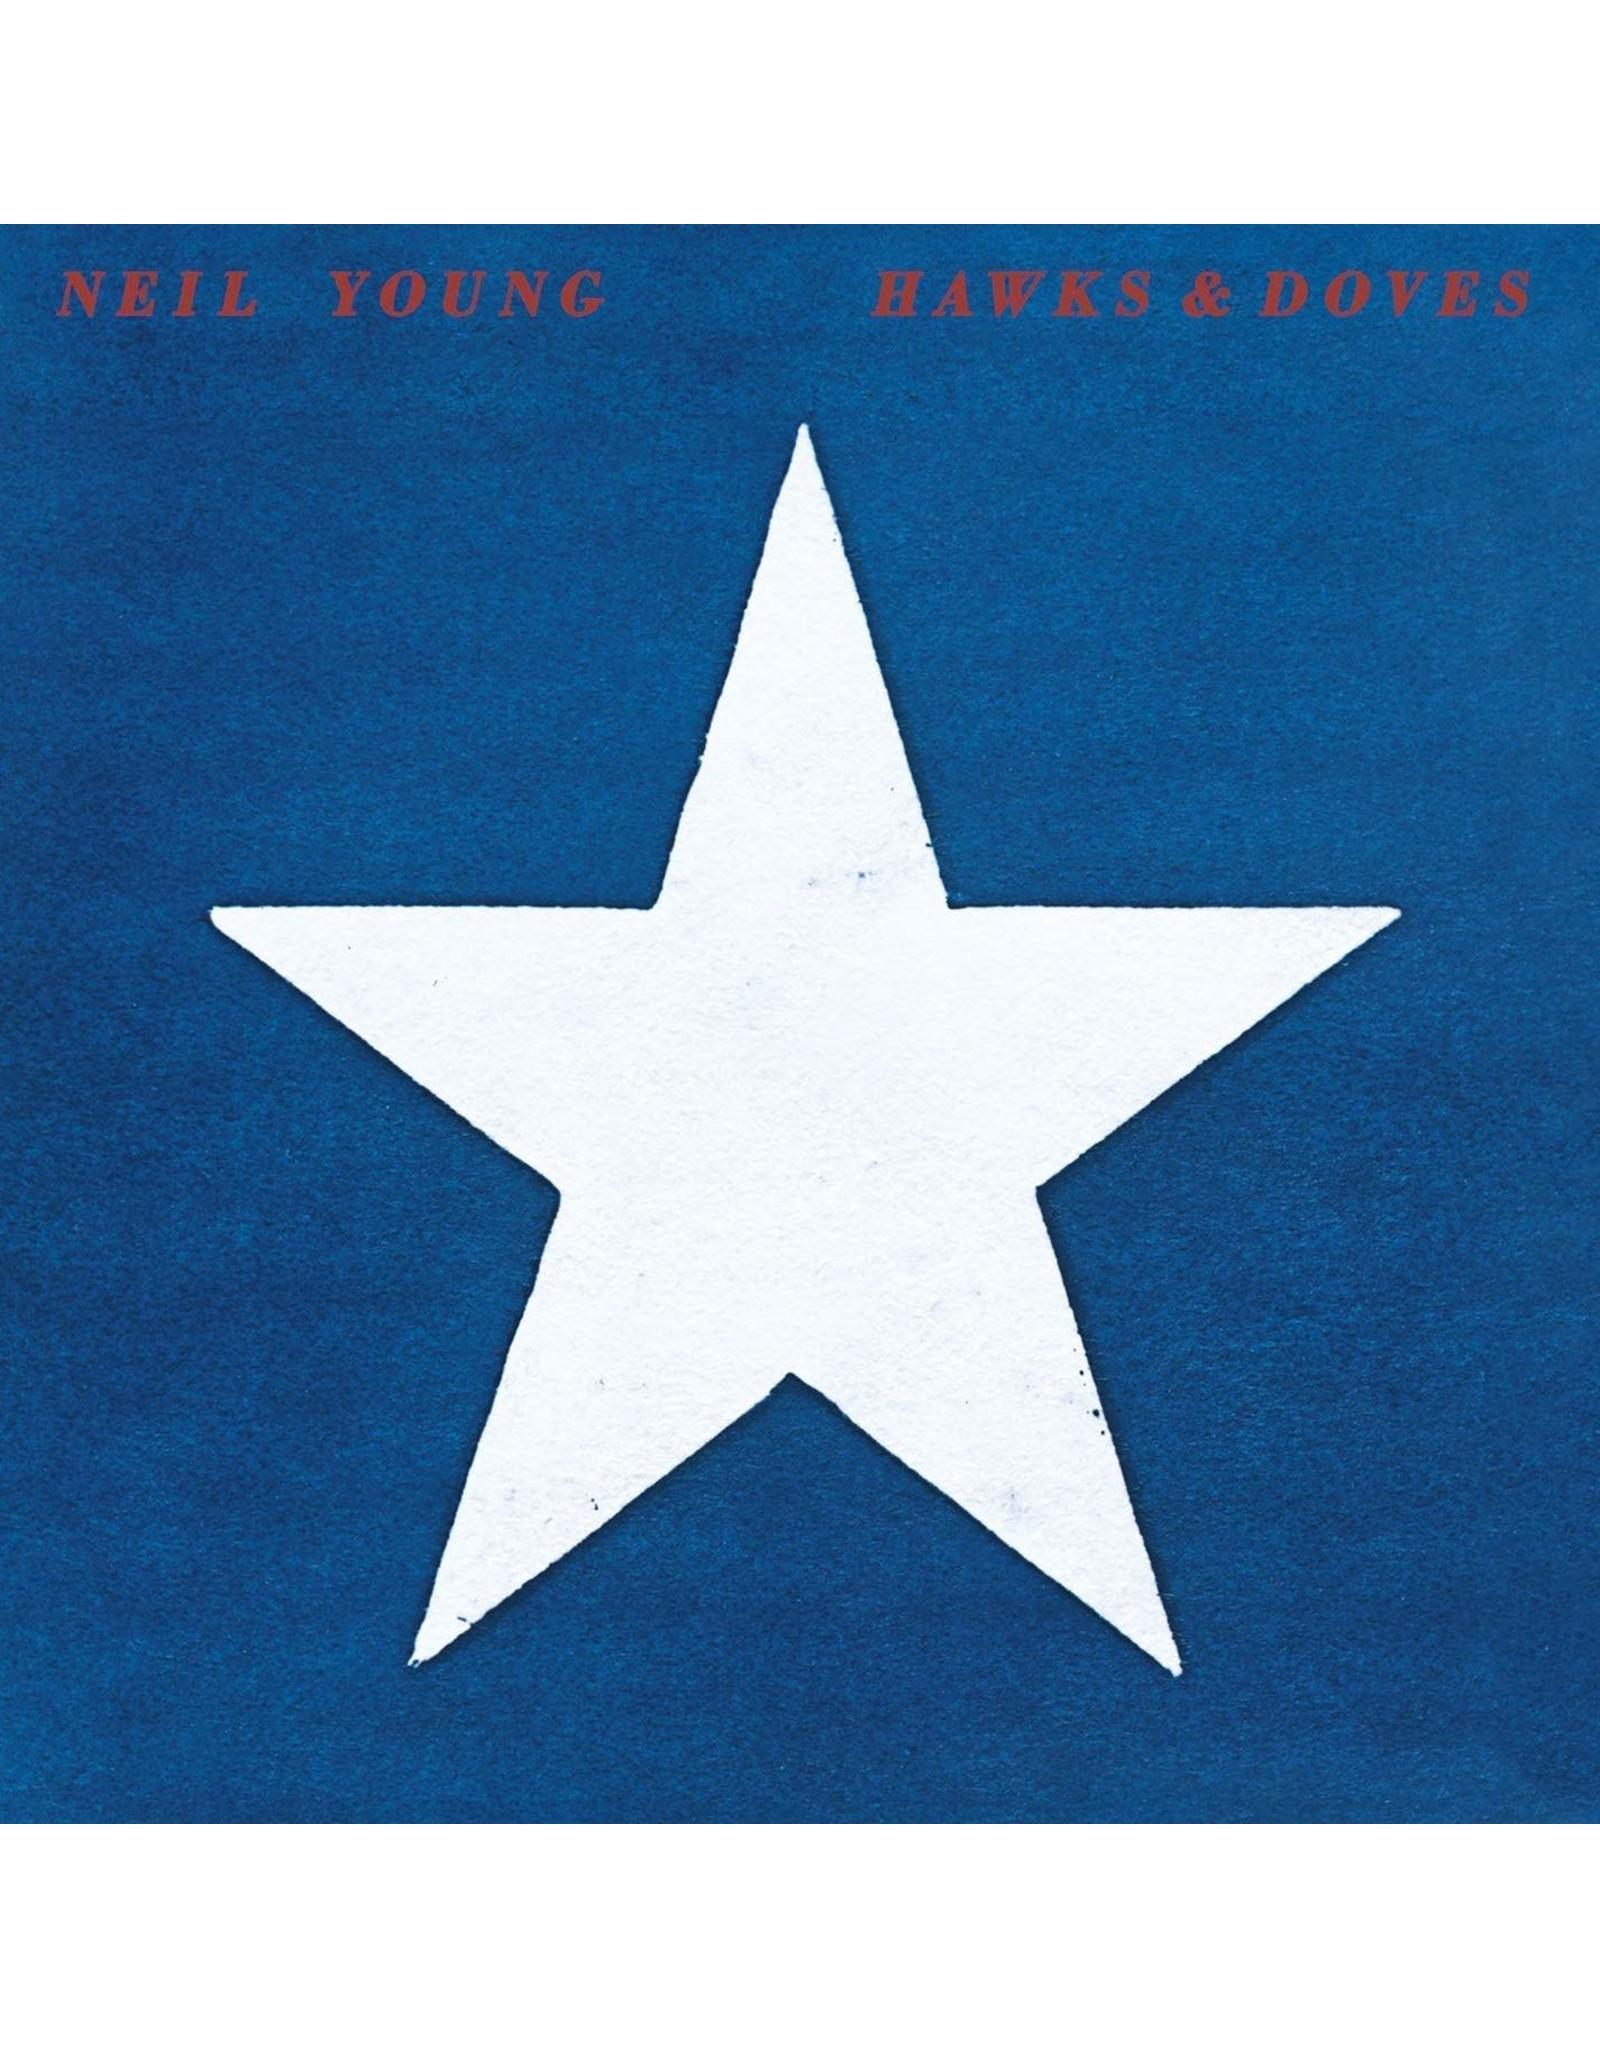 Young, Neil - Hawks & Doves LP